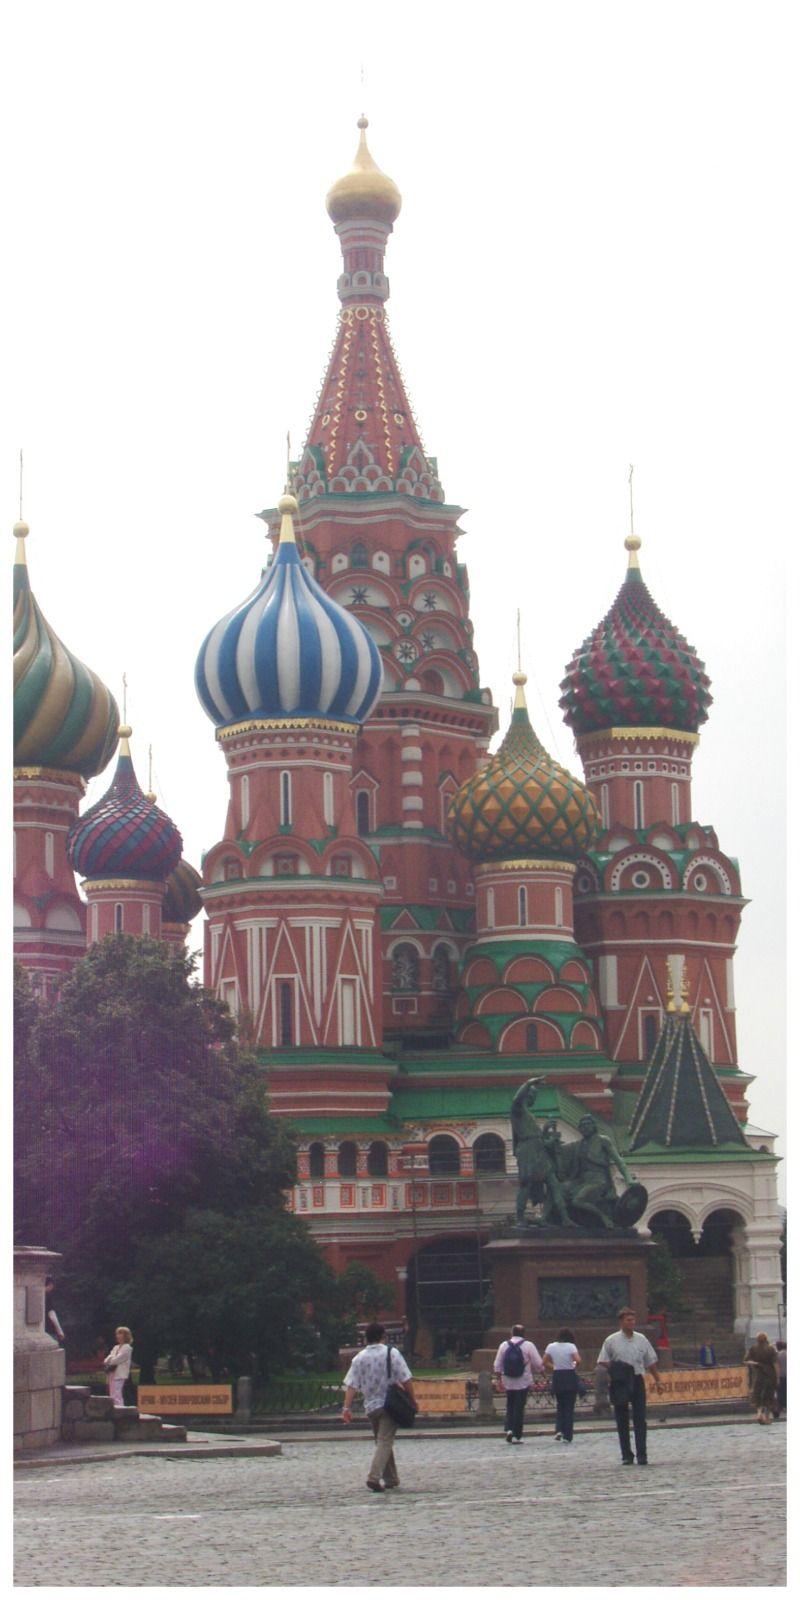 Rusland Moskou Rode Plein Basilius Kathedraa